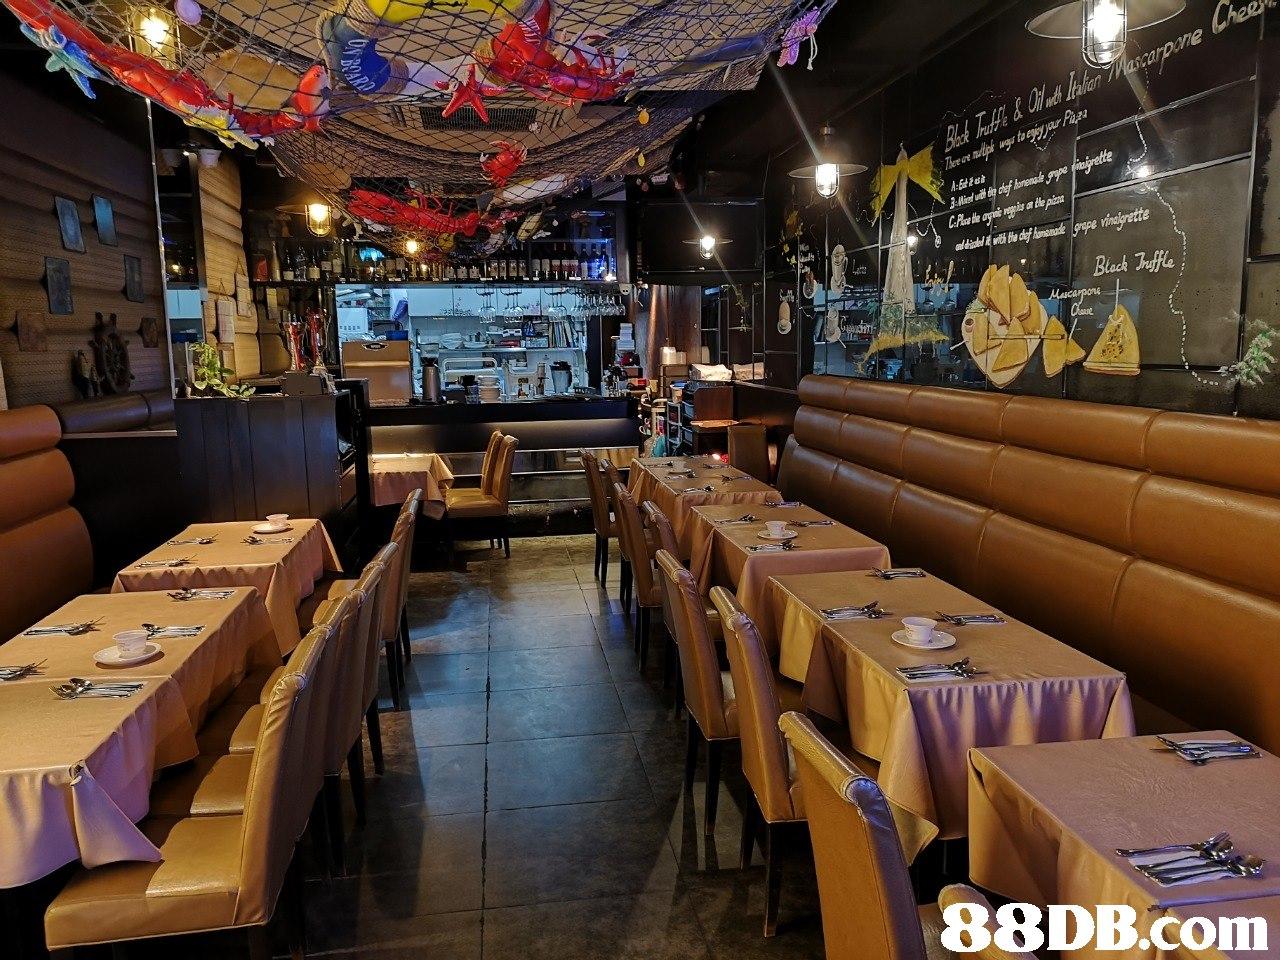 Restaurant,Building,Bar,Tavern,Pub